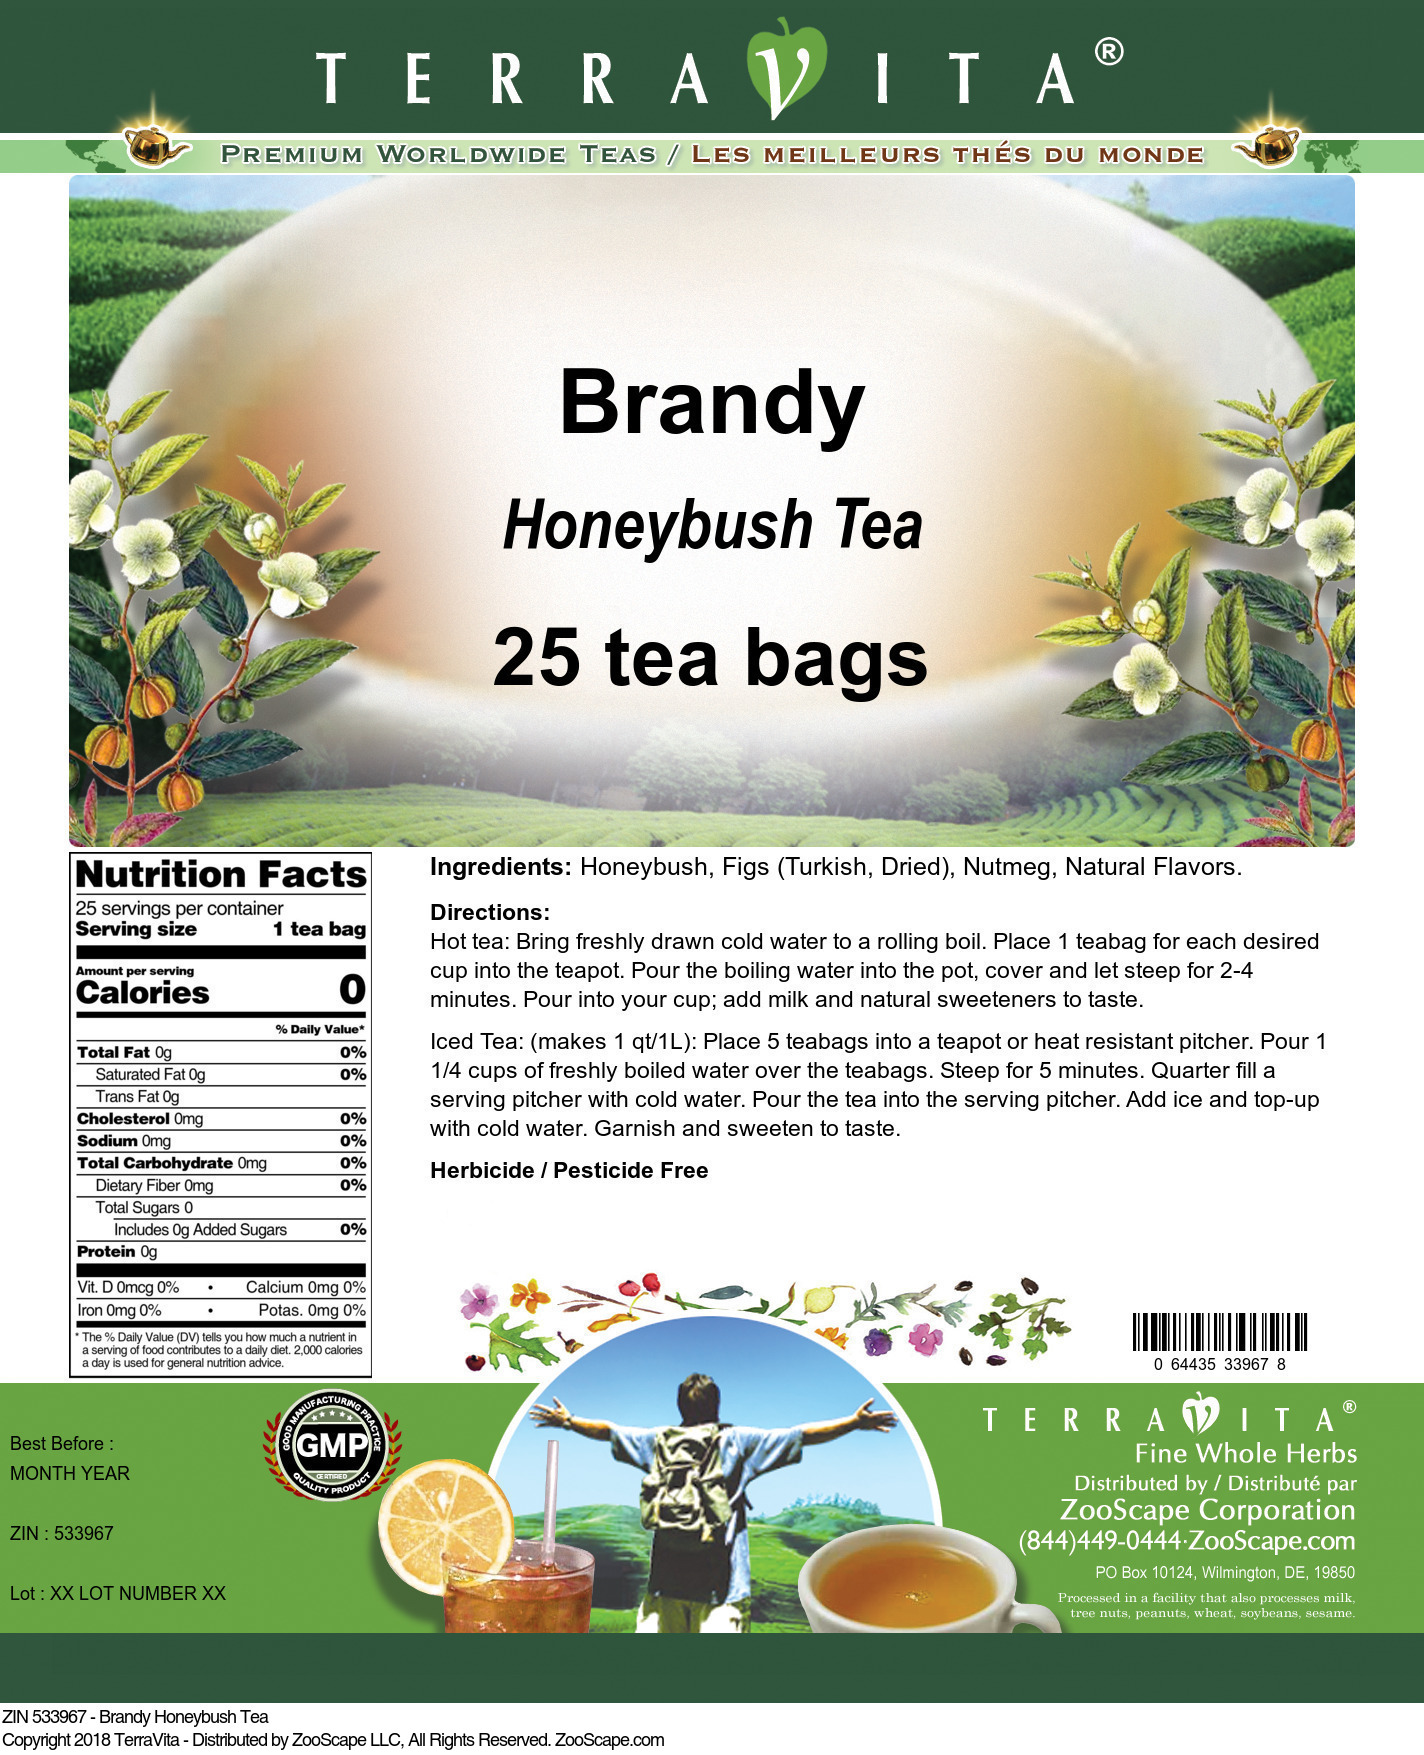 Brandy Honeybush Tea